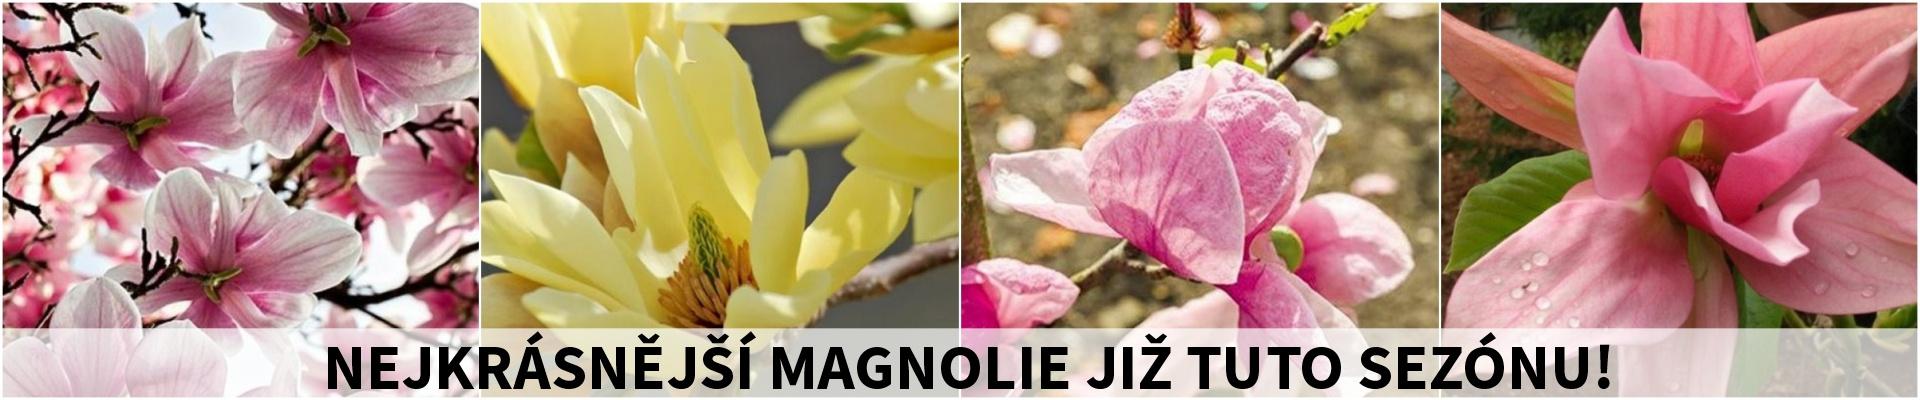 Magnolie jaro 2019